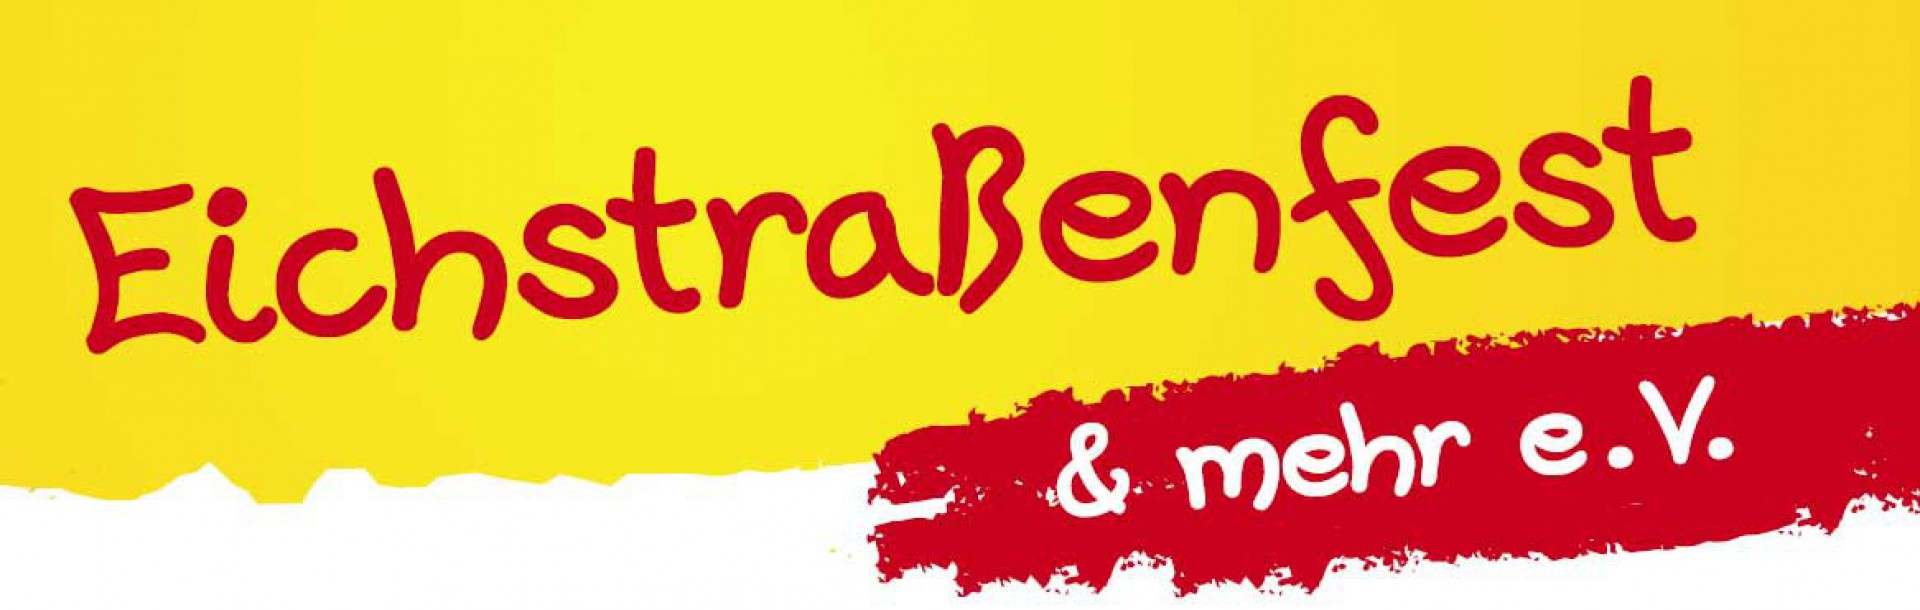 Eichstrassenfest & mehr e.V